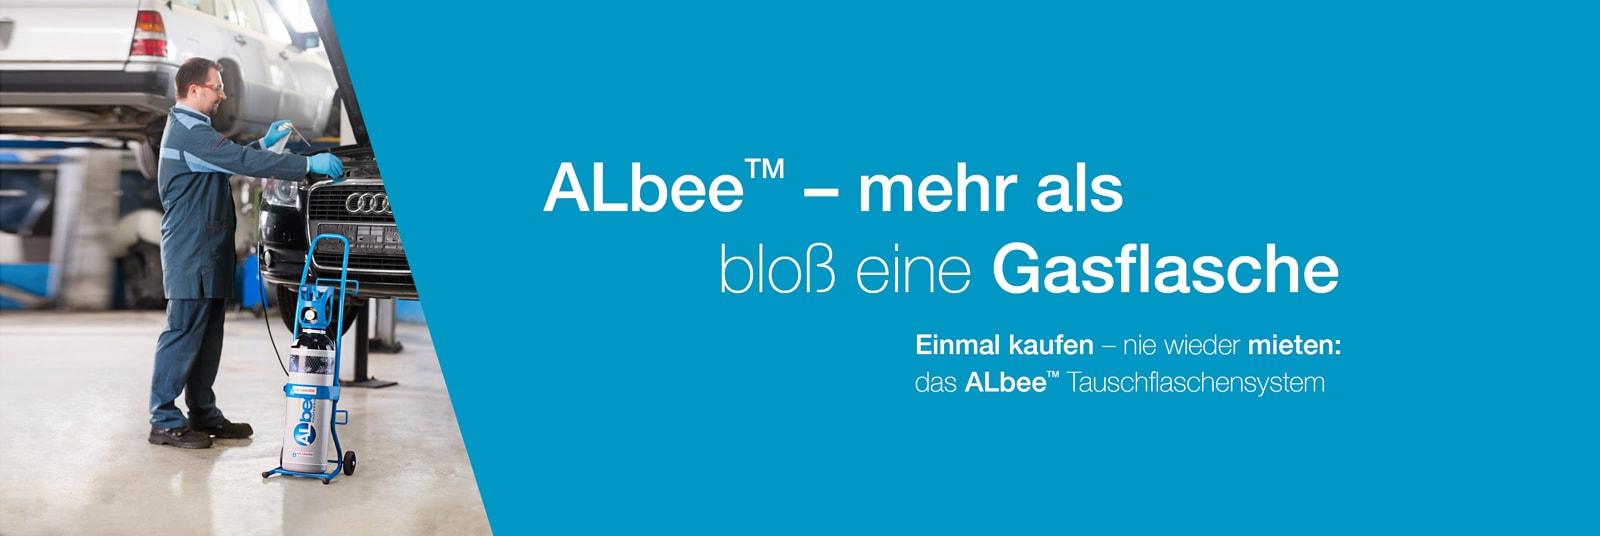 ALbee™ Professional